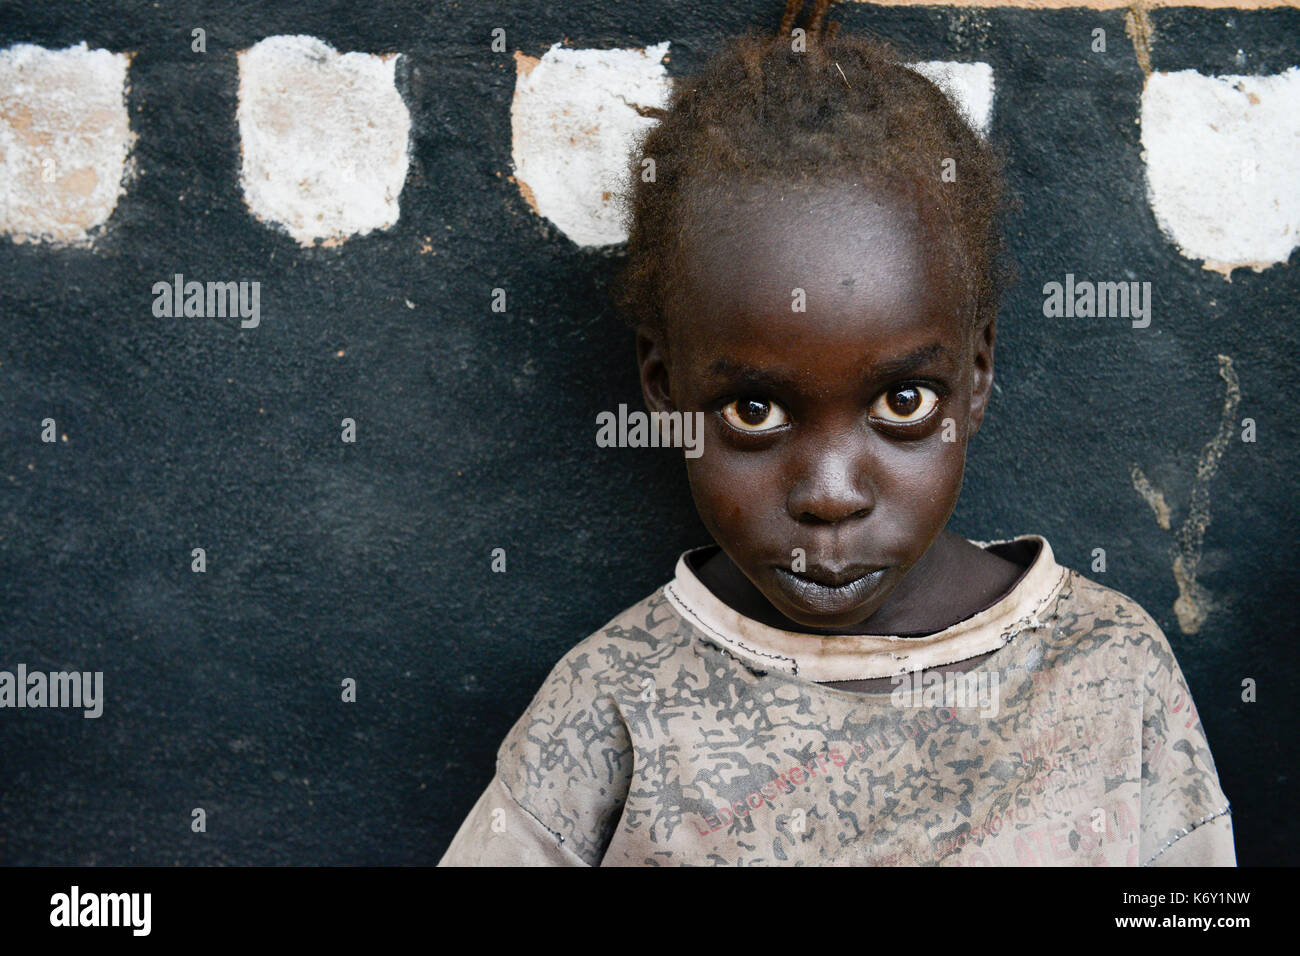 UGANDA, Arua, south sudanese refugees in Rhino camp refugee settlement , Nuer girl / suedsudanesische Fluechtlinge im Fluechtlingslager Rhino Camp, Nuer Maedchen - Stock Image